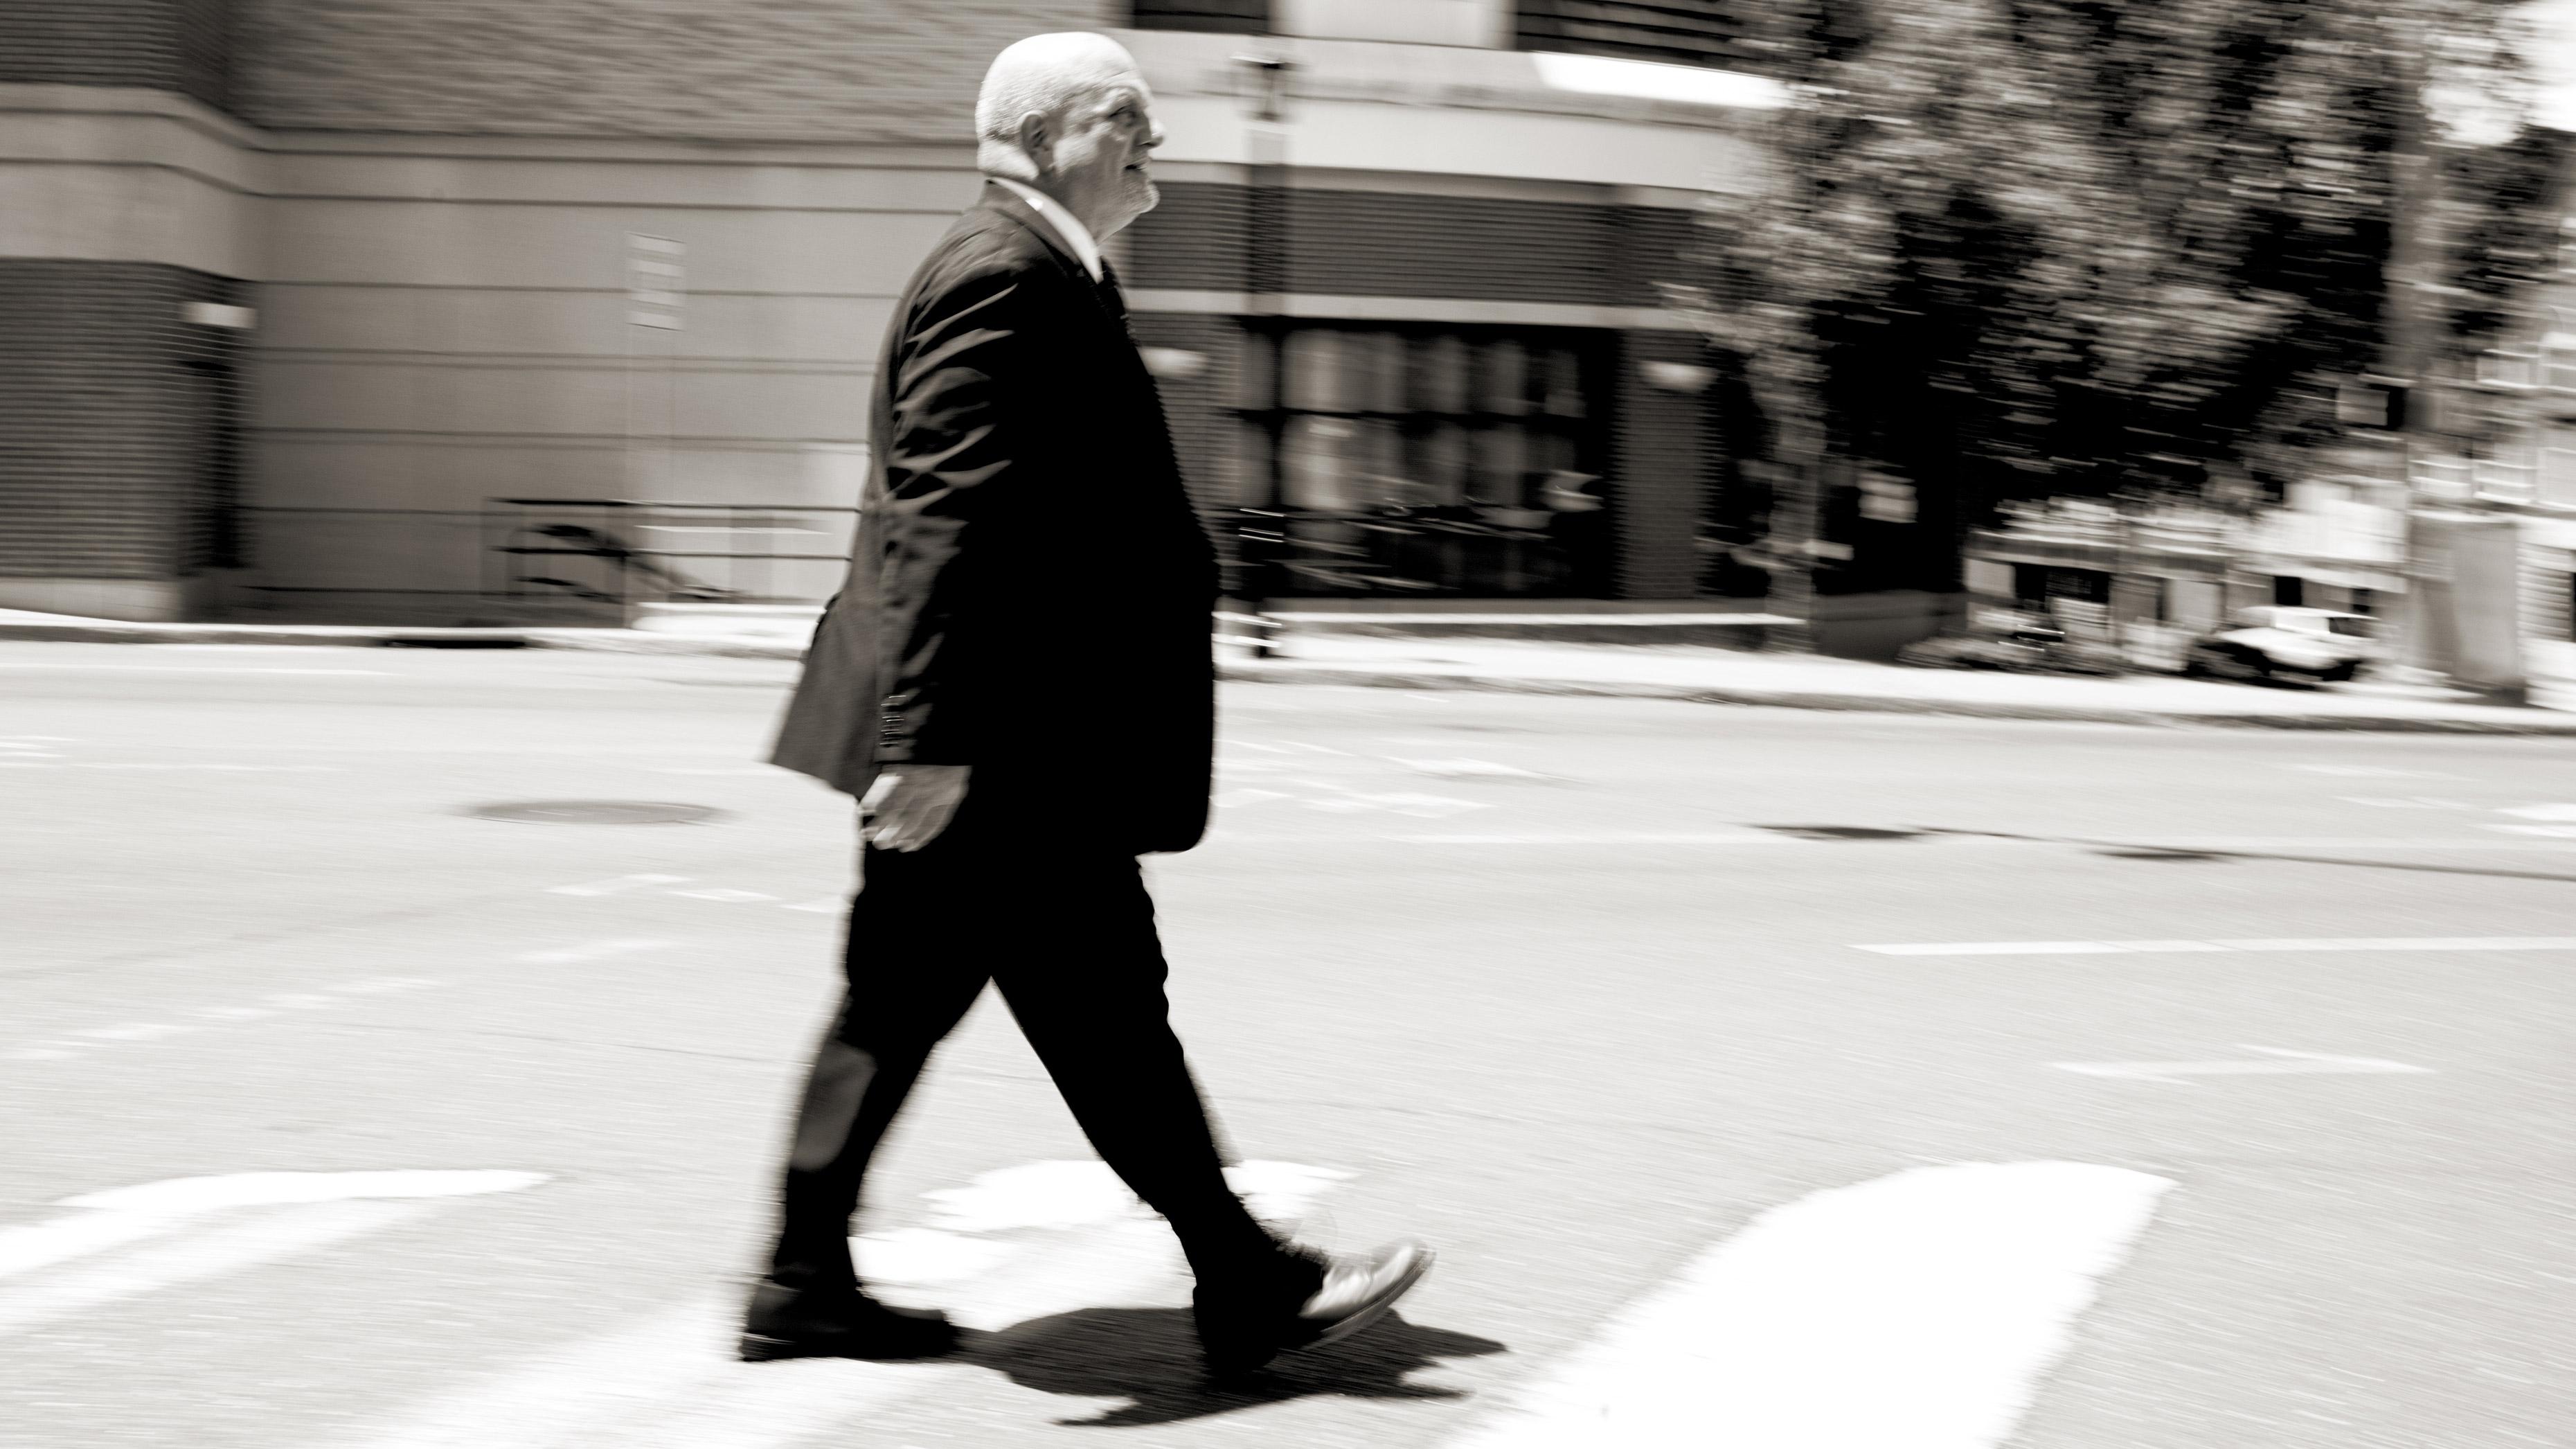 Dr. Steven Schneider of Sant Marys Hospital taking a walk through downtown Waterbury